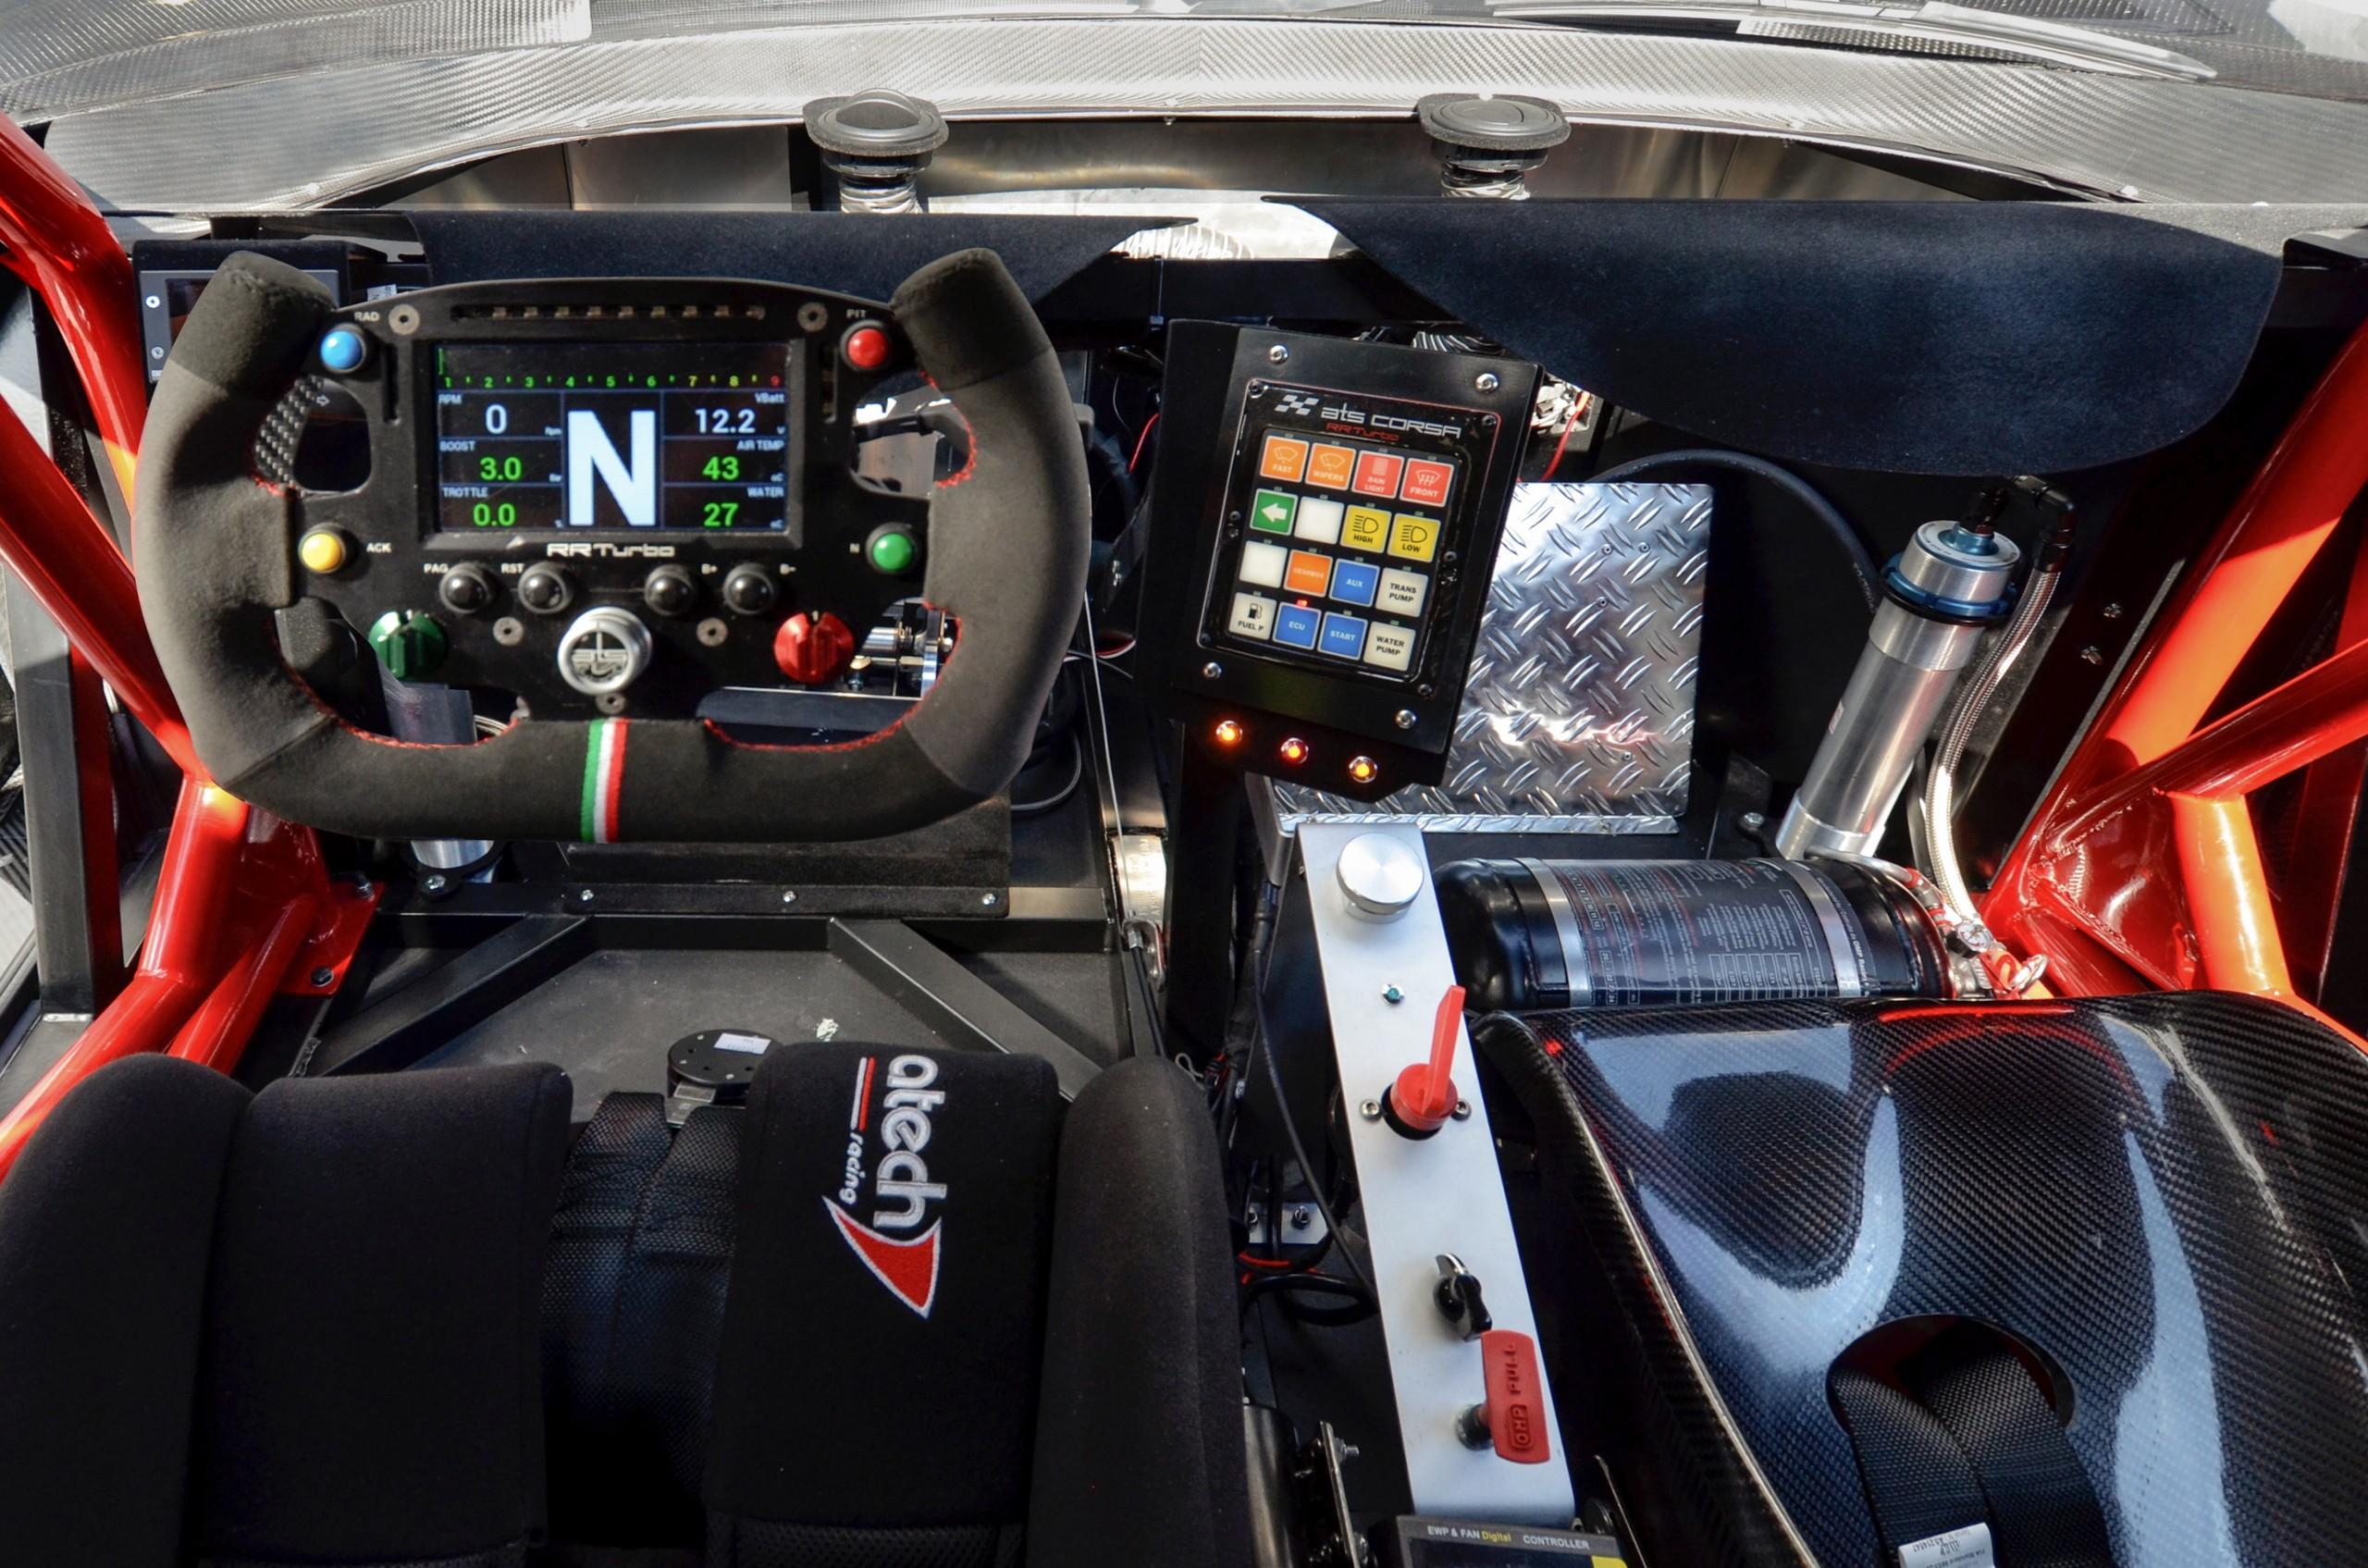 ATS-Corsa-RR-Turbo-Serie-Carbonio-27